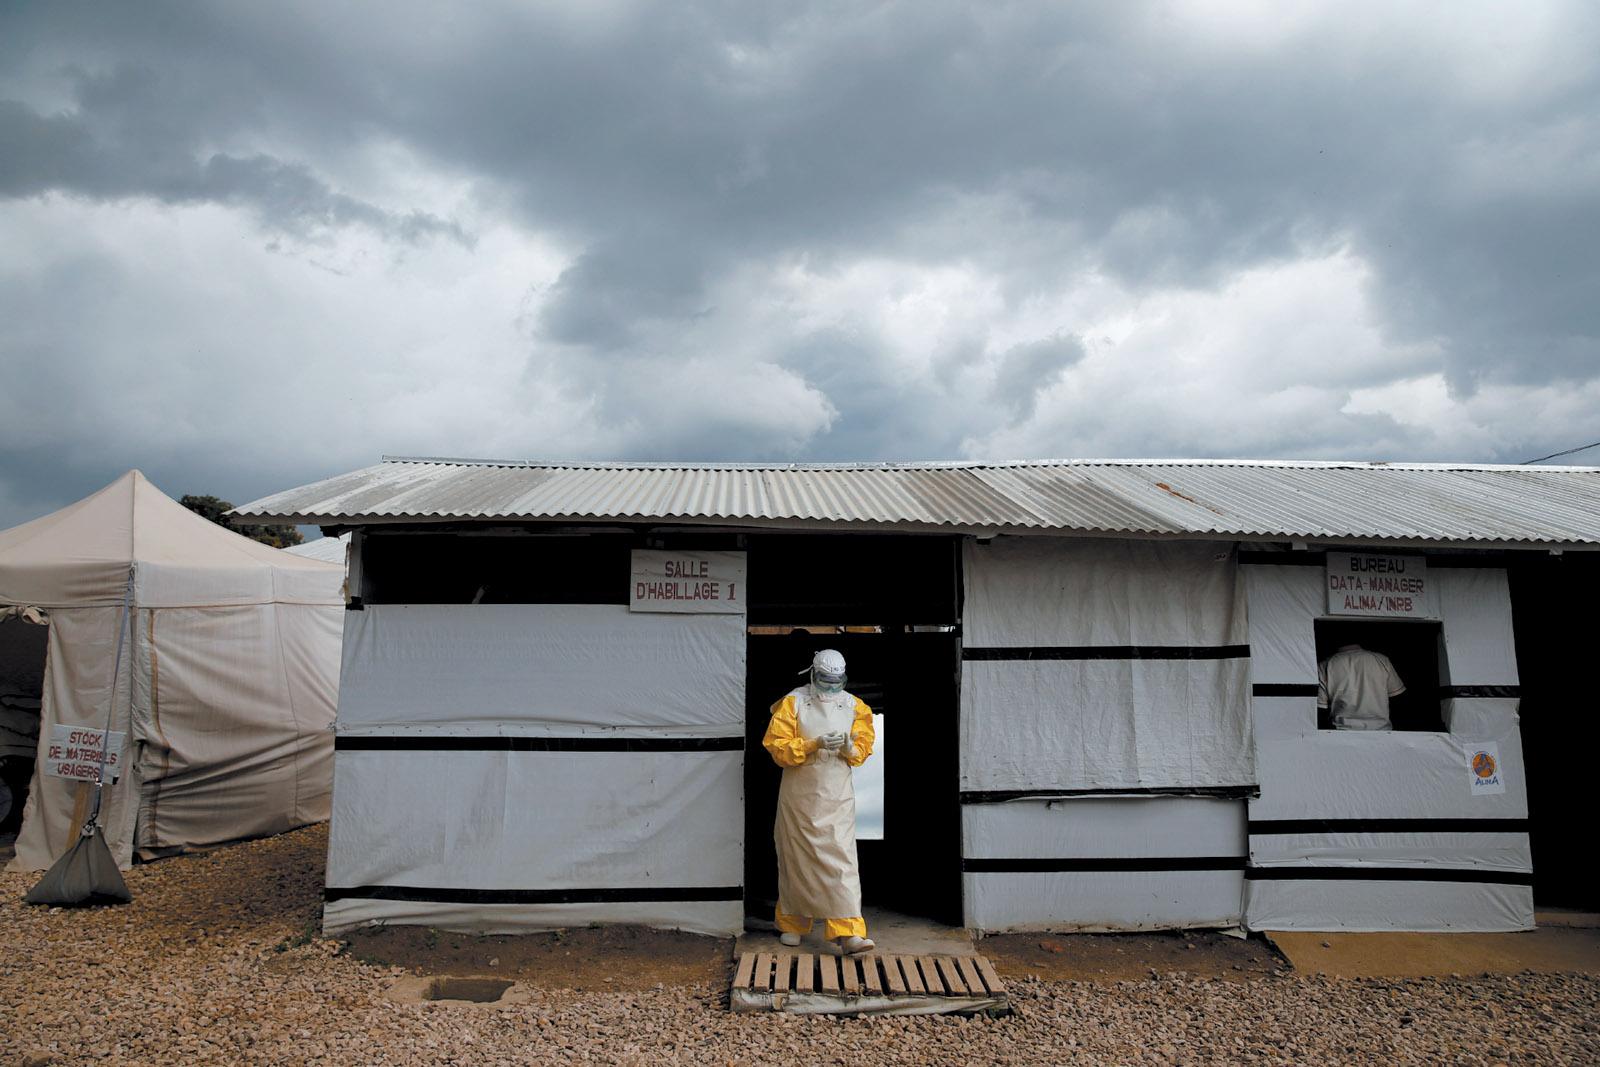 A health worker in an Ebola treatment center, Beni, North Kivu, Congo